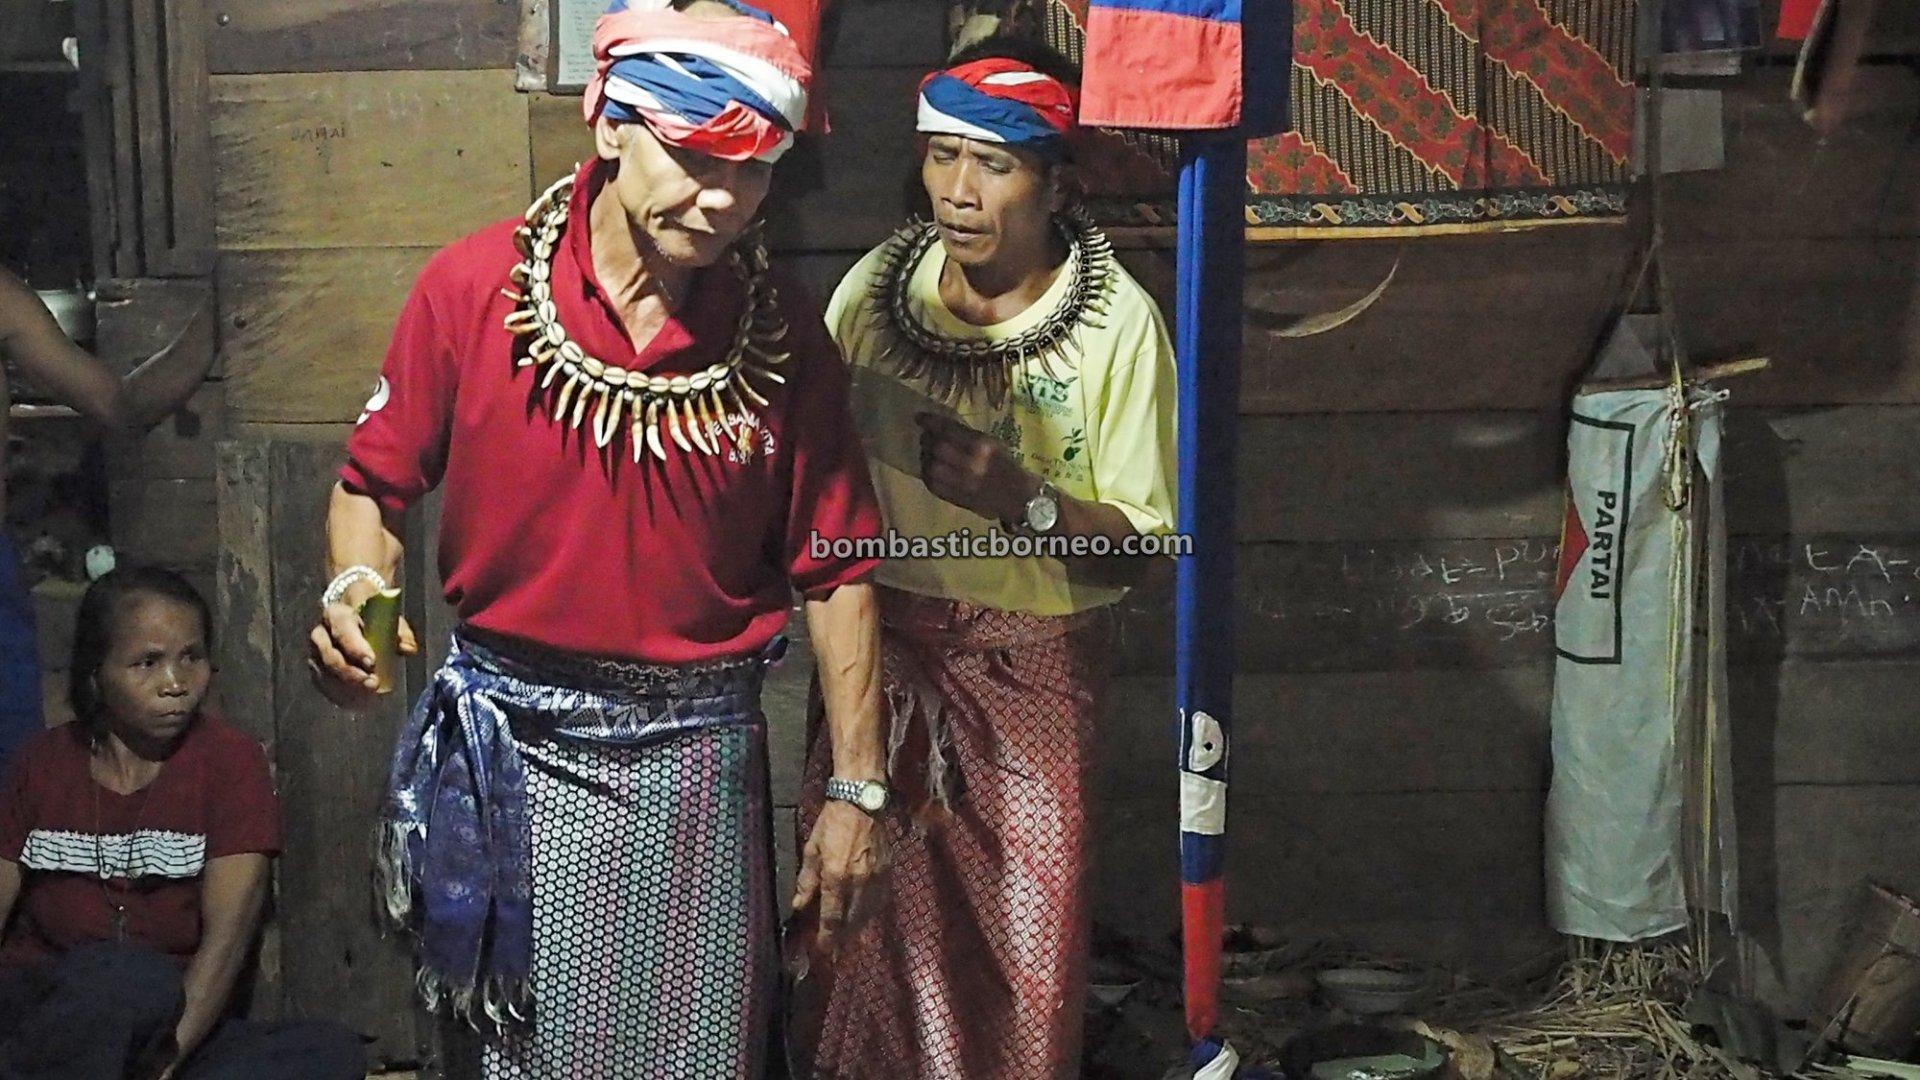 authentic, indigenous, Gawai Padi, thanksgiving, ethnic, native, tribe, Dayak Bidayuh, wisata budaya, Tourism, travel guide, Trans Border, Borneo, 探索婆罗洲游踪, 印尼西加里曼丹, 原住民传统文化,